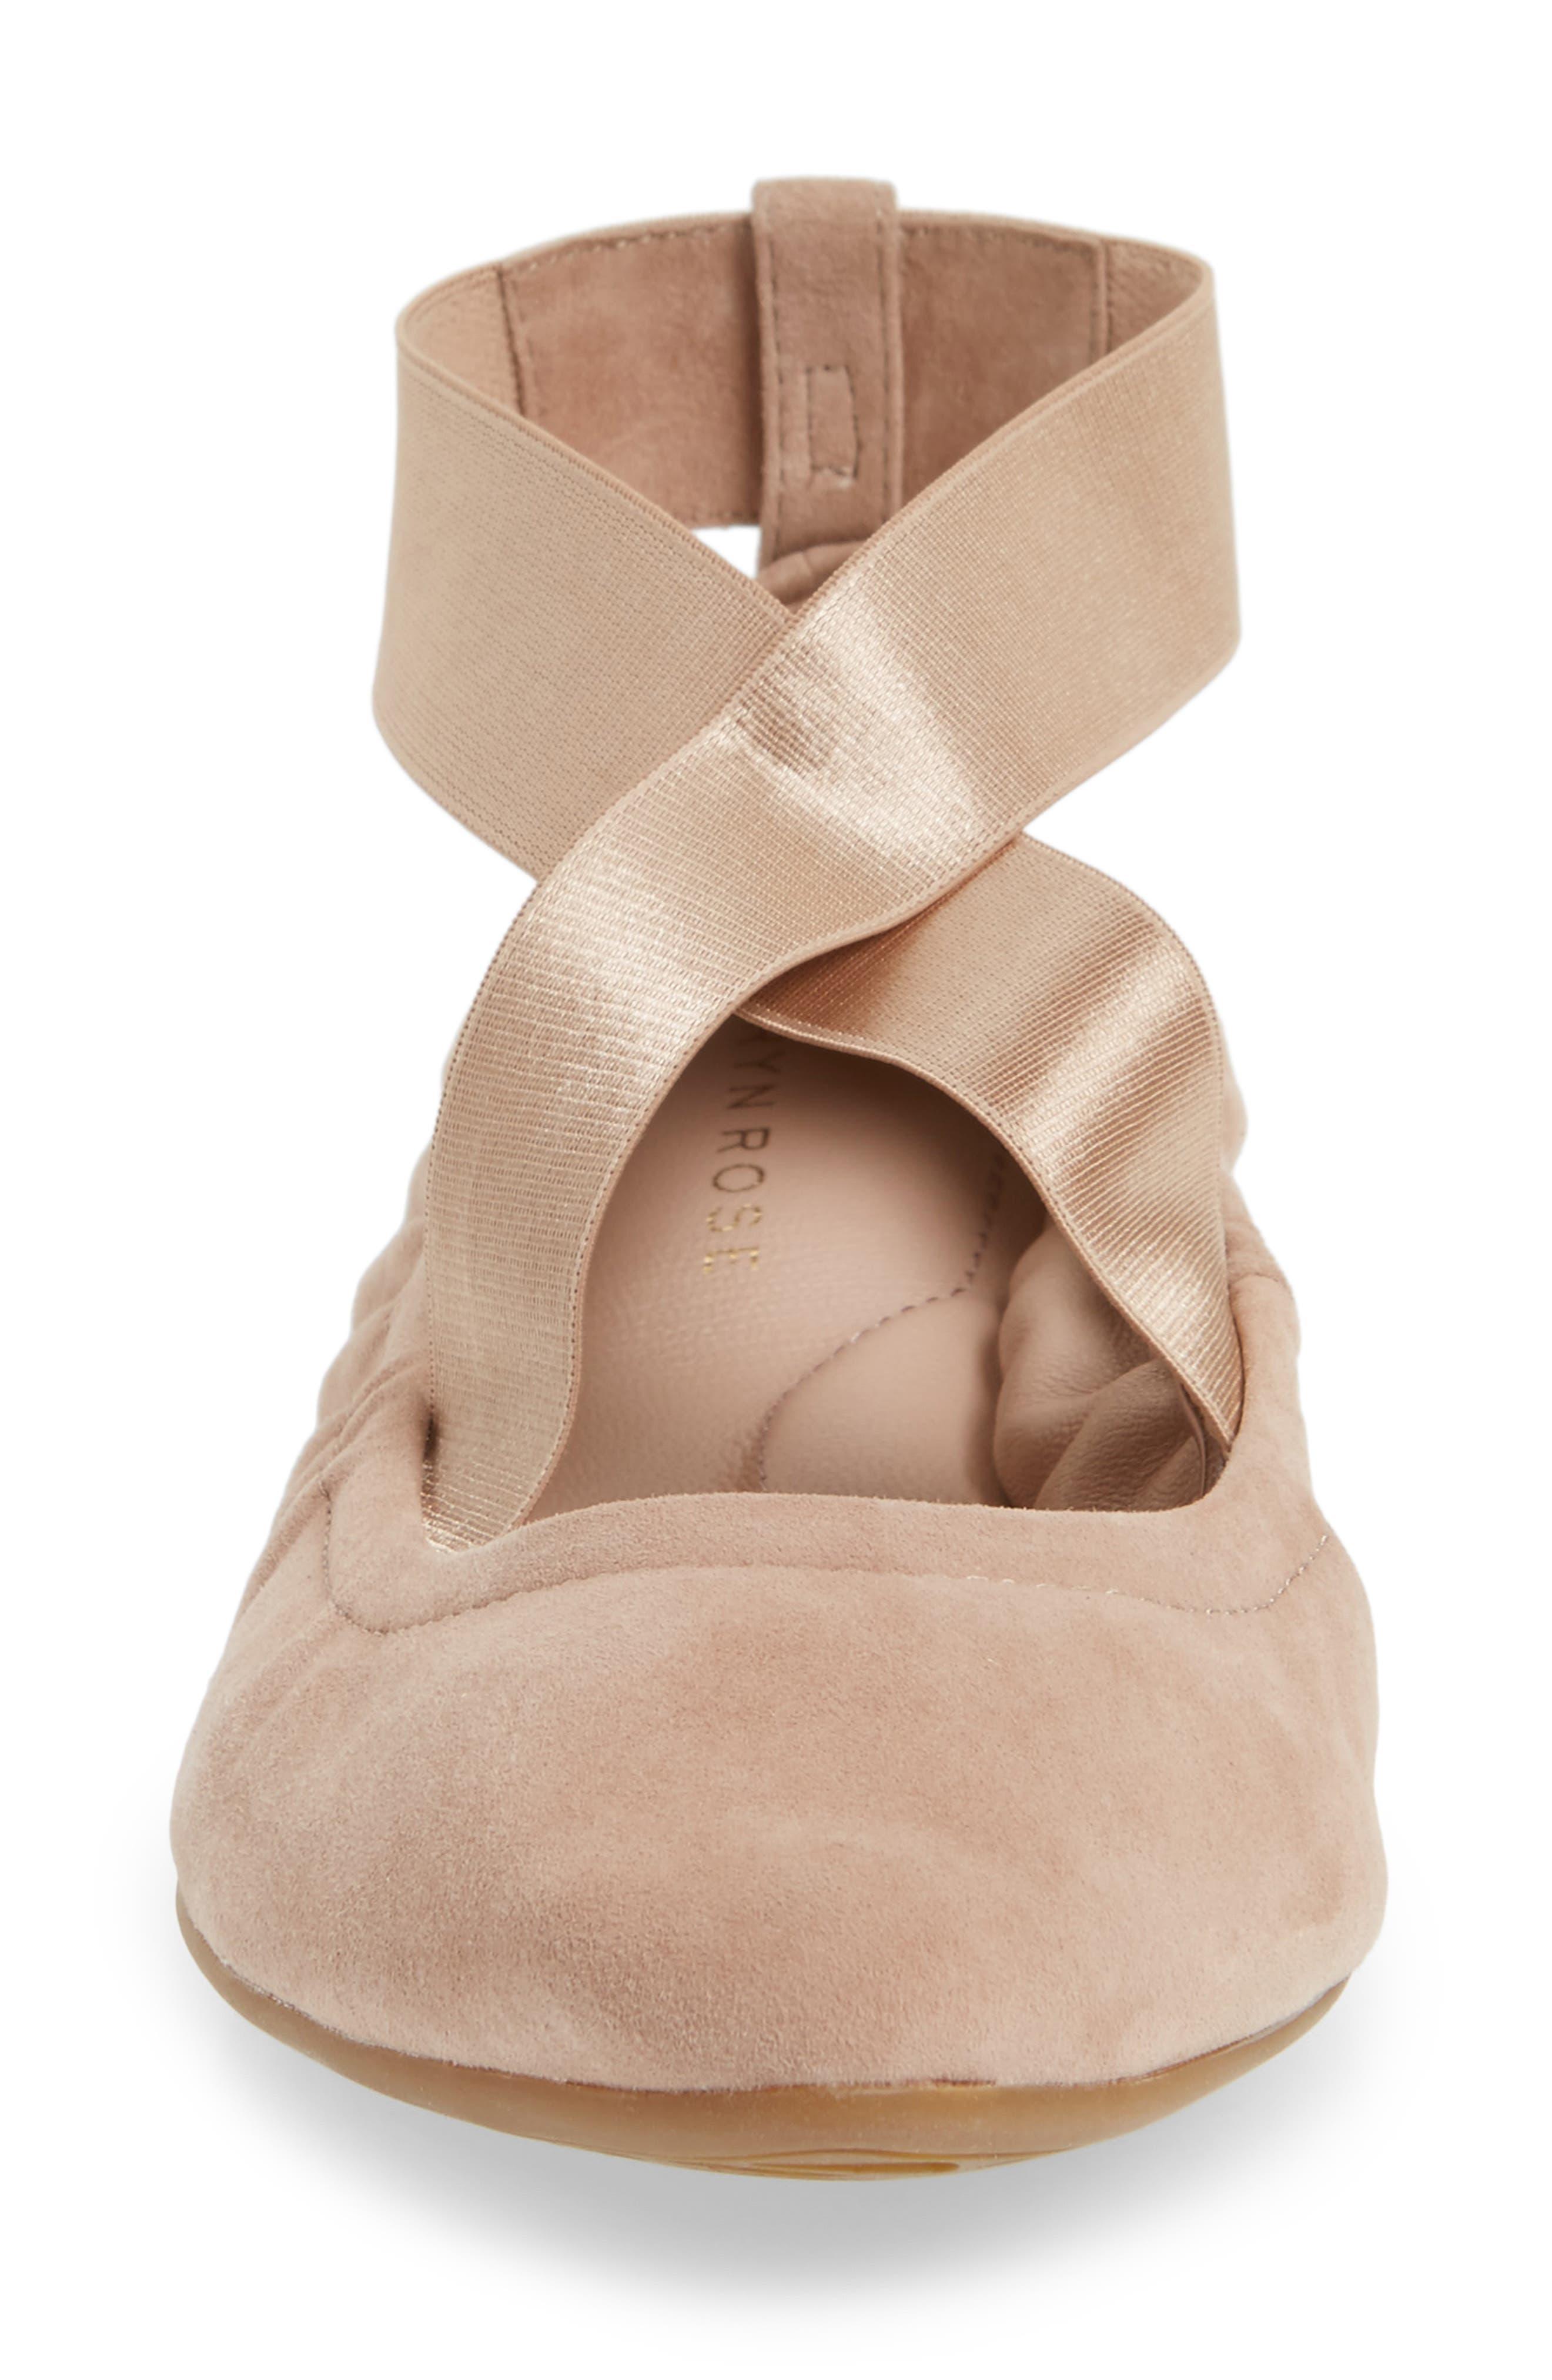 Edina Strappy Ballet Flat,                             Alternate thumbnail 4, color,                             Soft Beige Suede